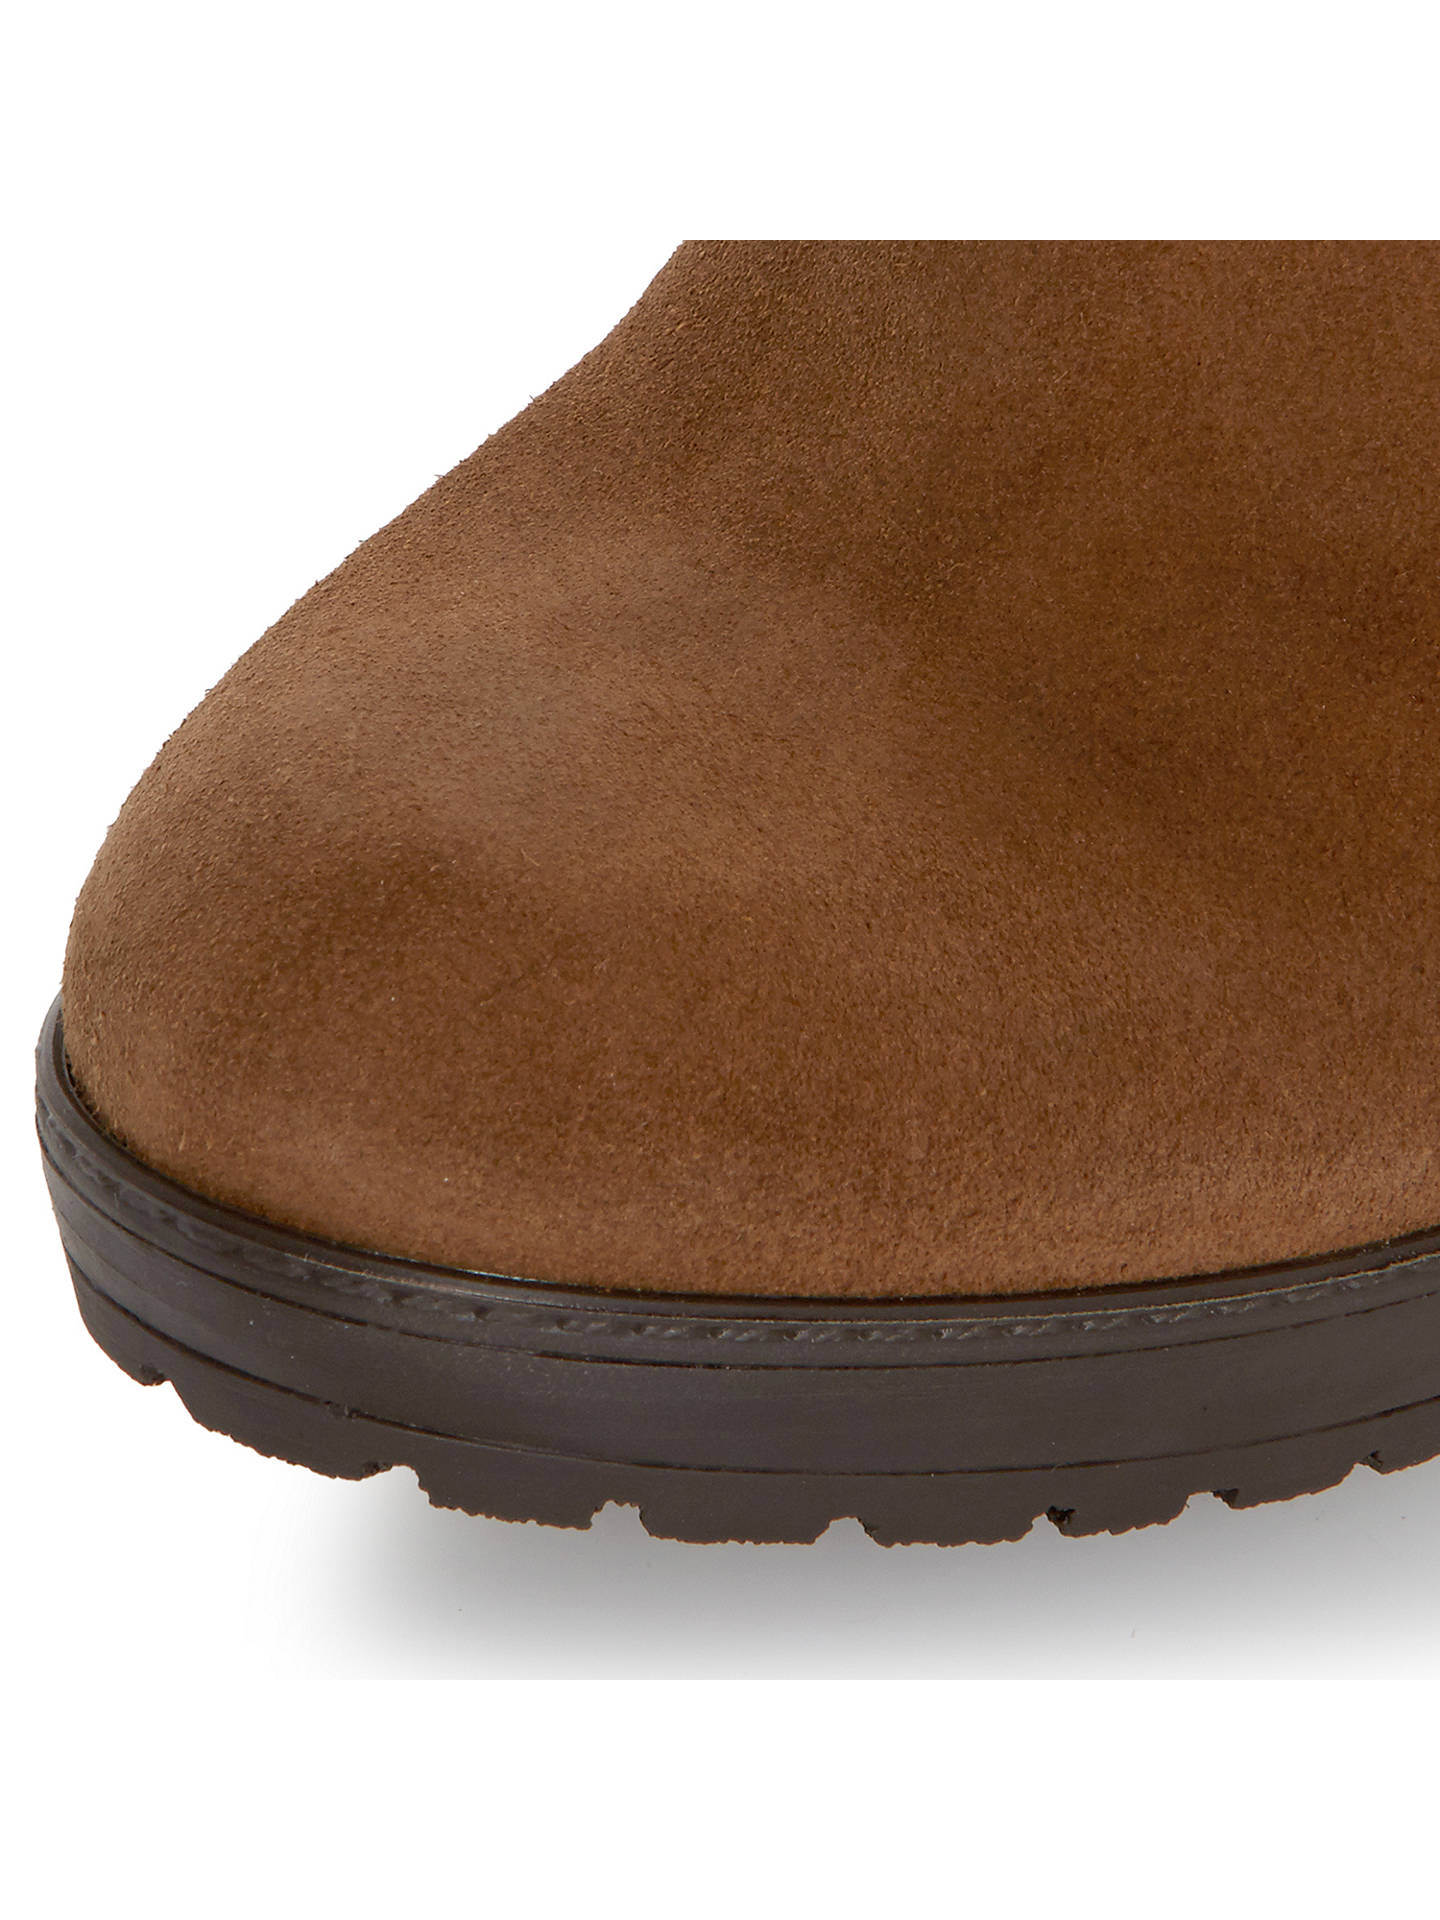 0c60201d9dd51 Dune Stetson Block Heeled Fringe Detail Knee Boots at John Lewis ...